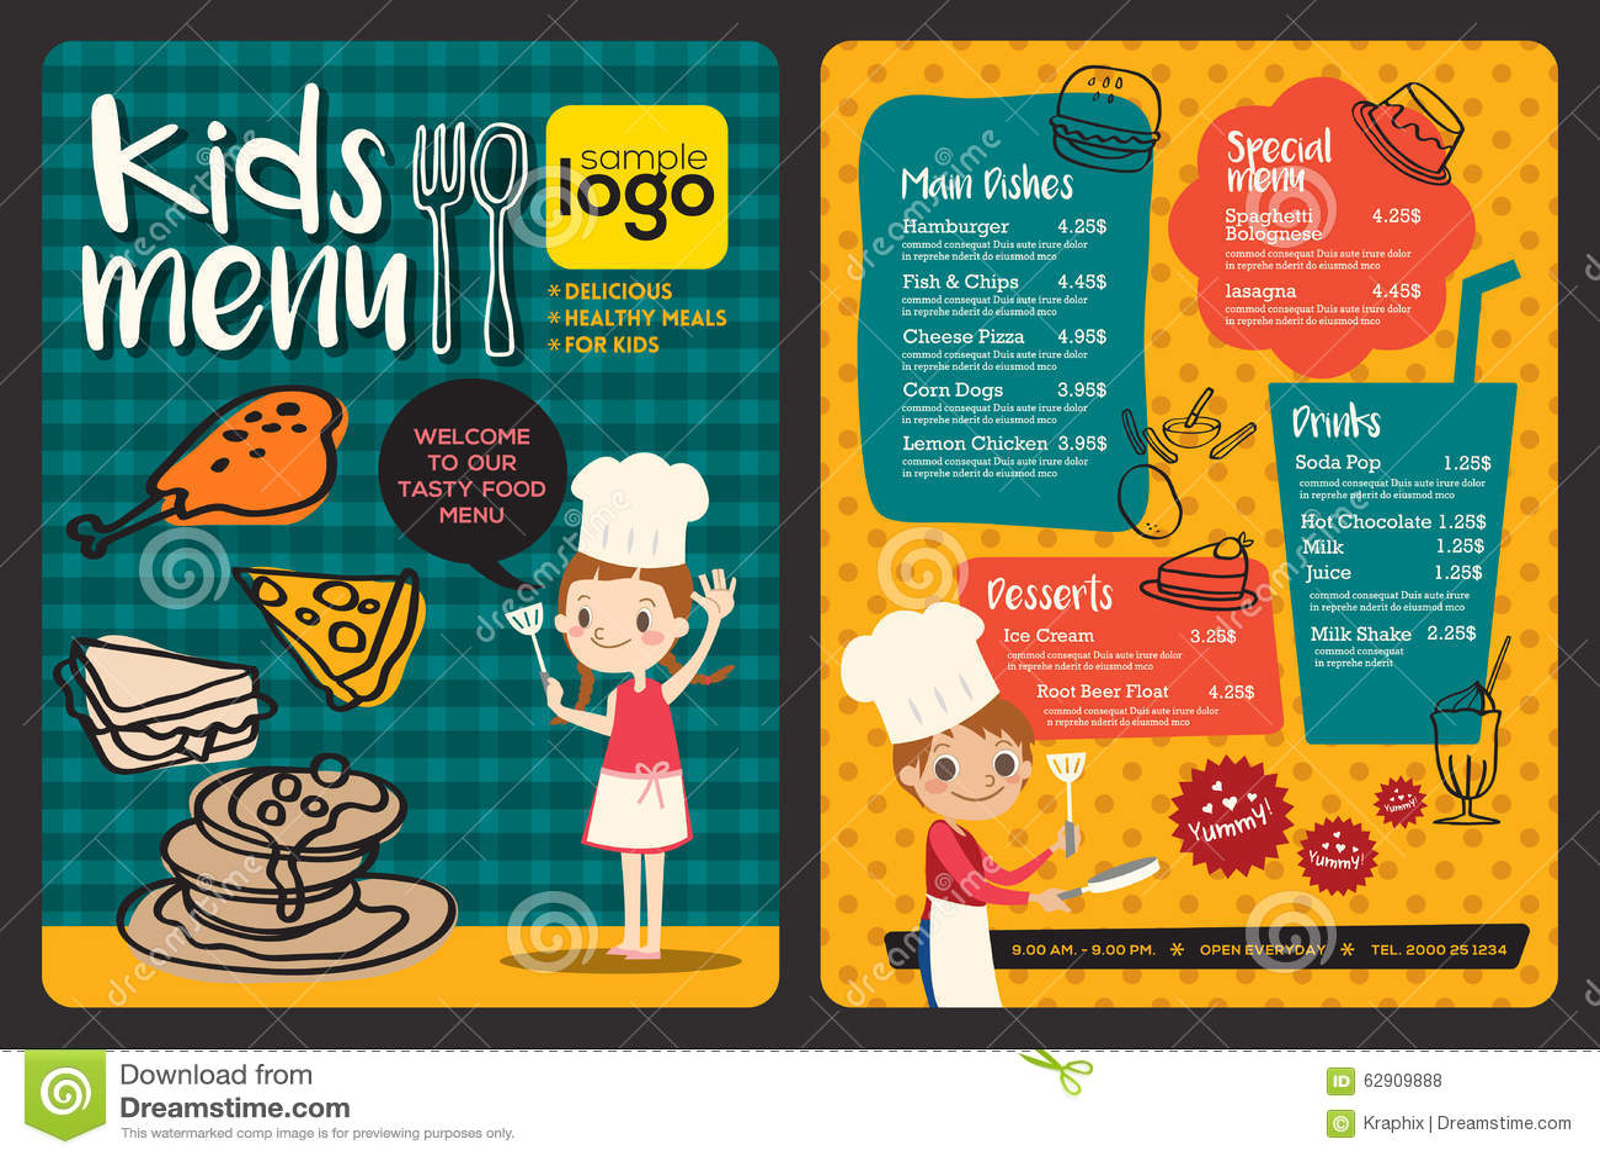 Cute Colorful Kids Meal Menu Template Stock Vector